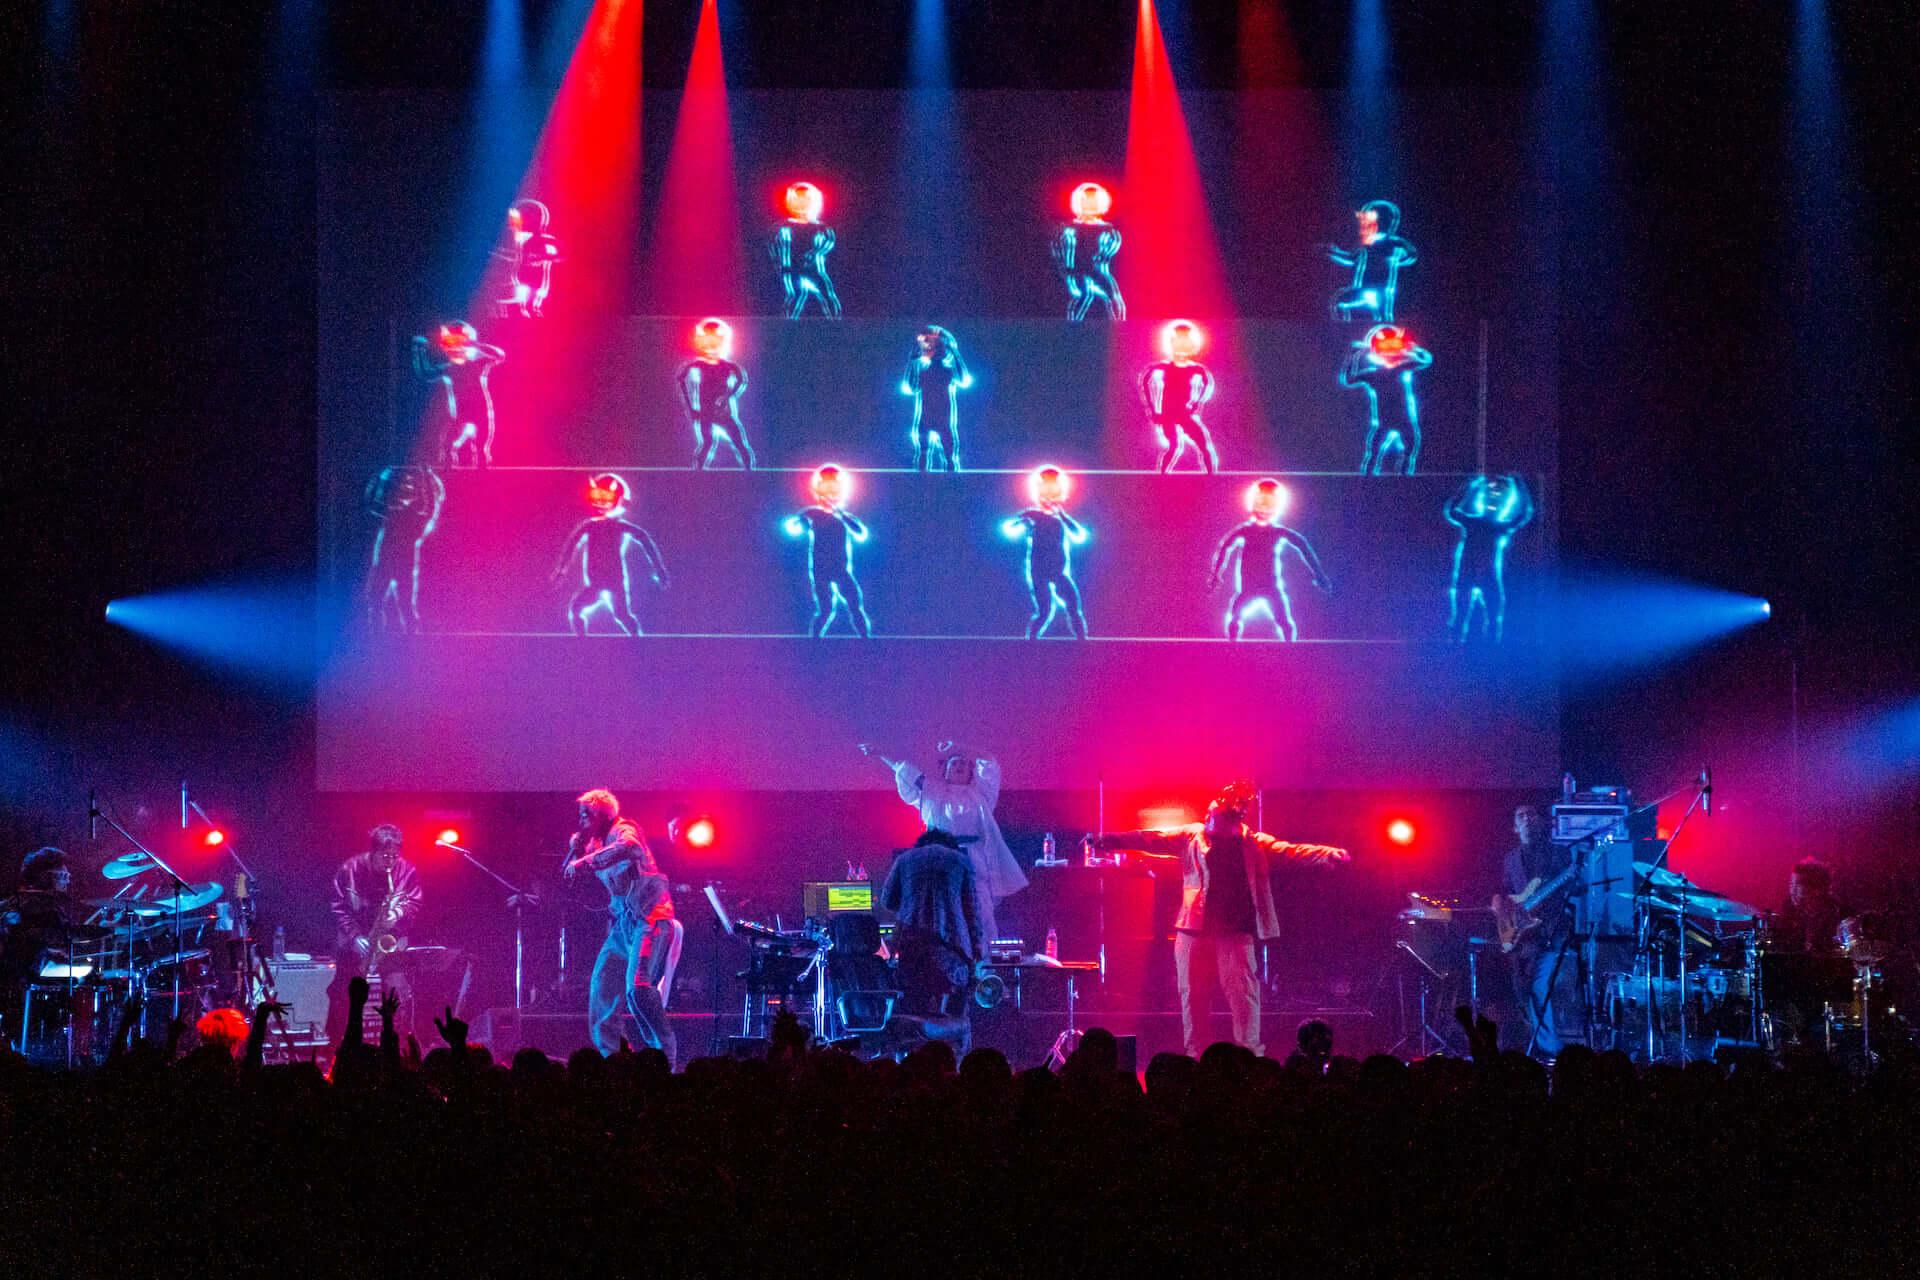 King Gnu常田大希率いるmillennium parade、Diorとのコラボで話題の新曲「lost and found」を配信スタート!MVも解禁 music191206_millenniumparade_1-1920x1280